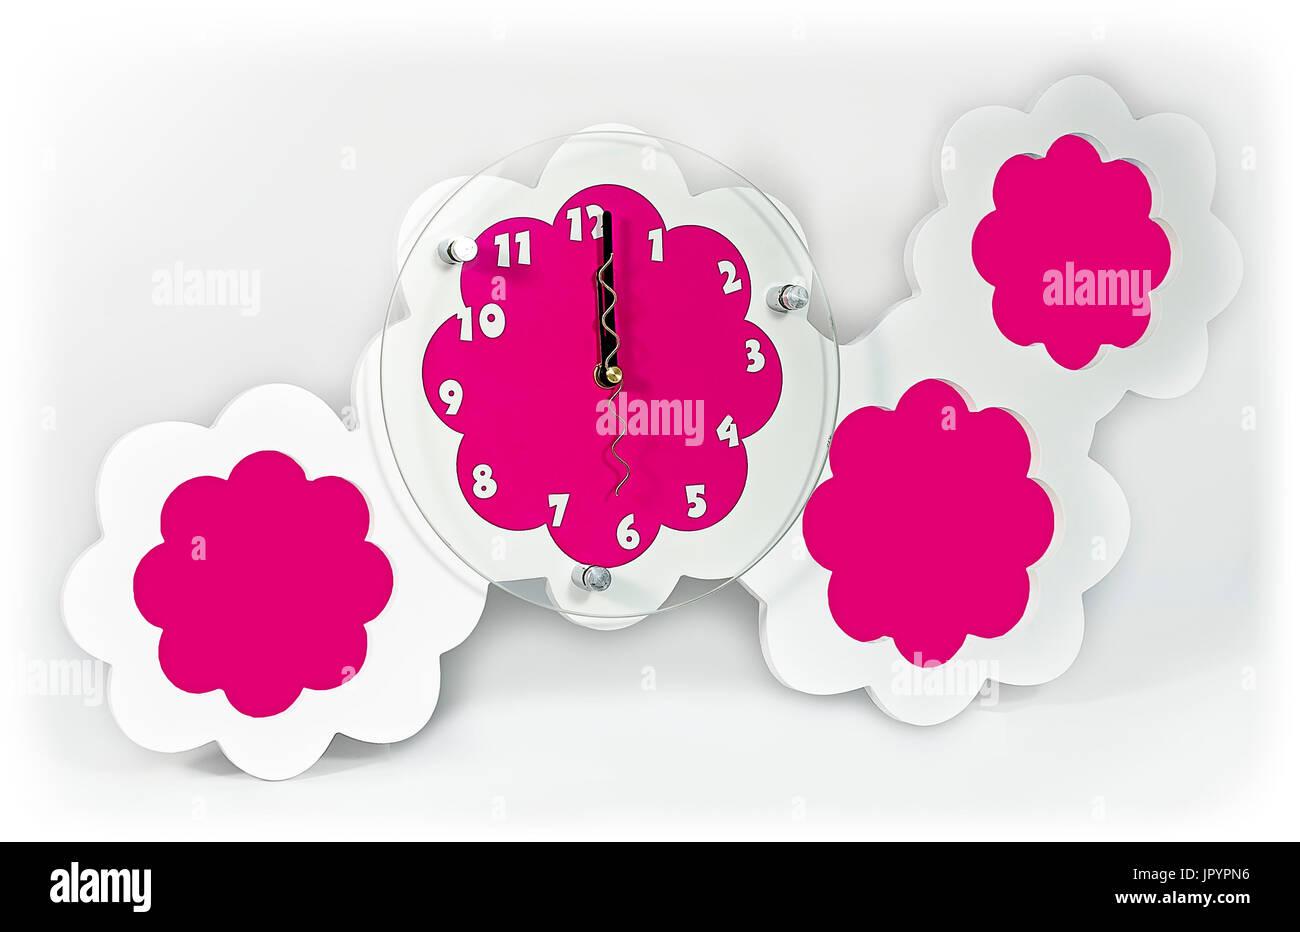 Weiß rosa Wanduhr mit Bilderrahmen Stockfoto, Bild: 151815922 - Alamy